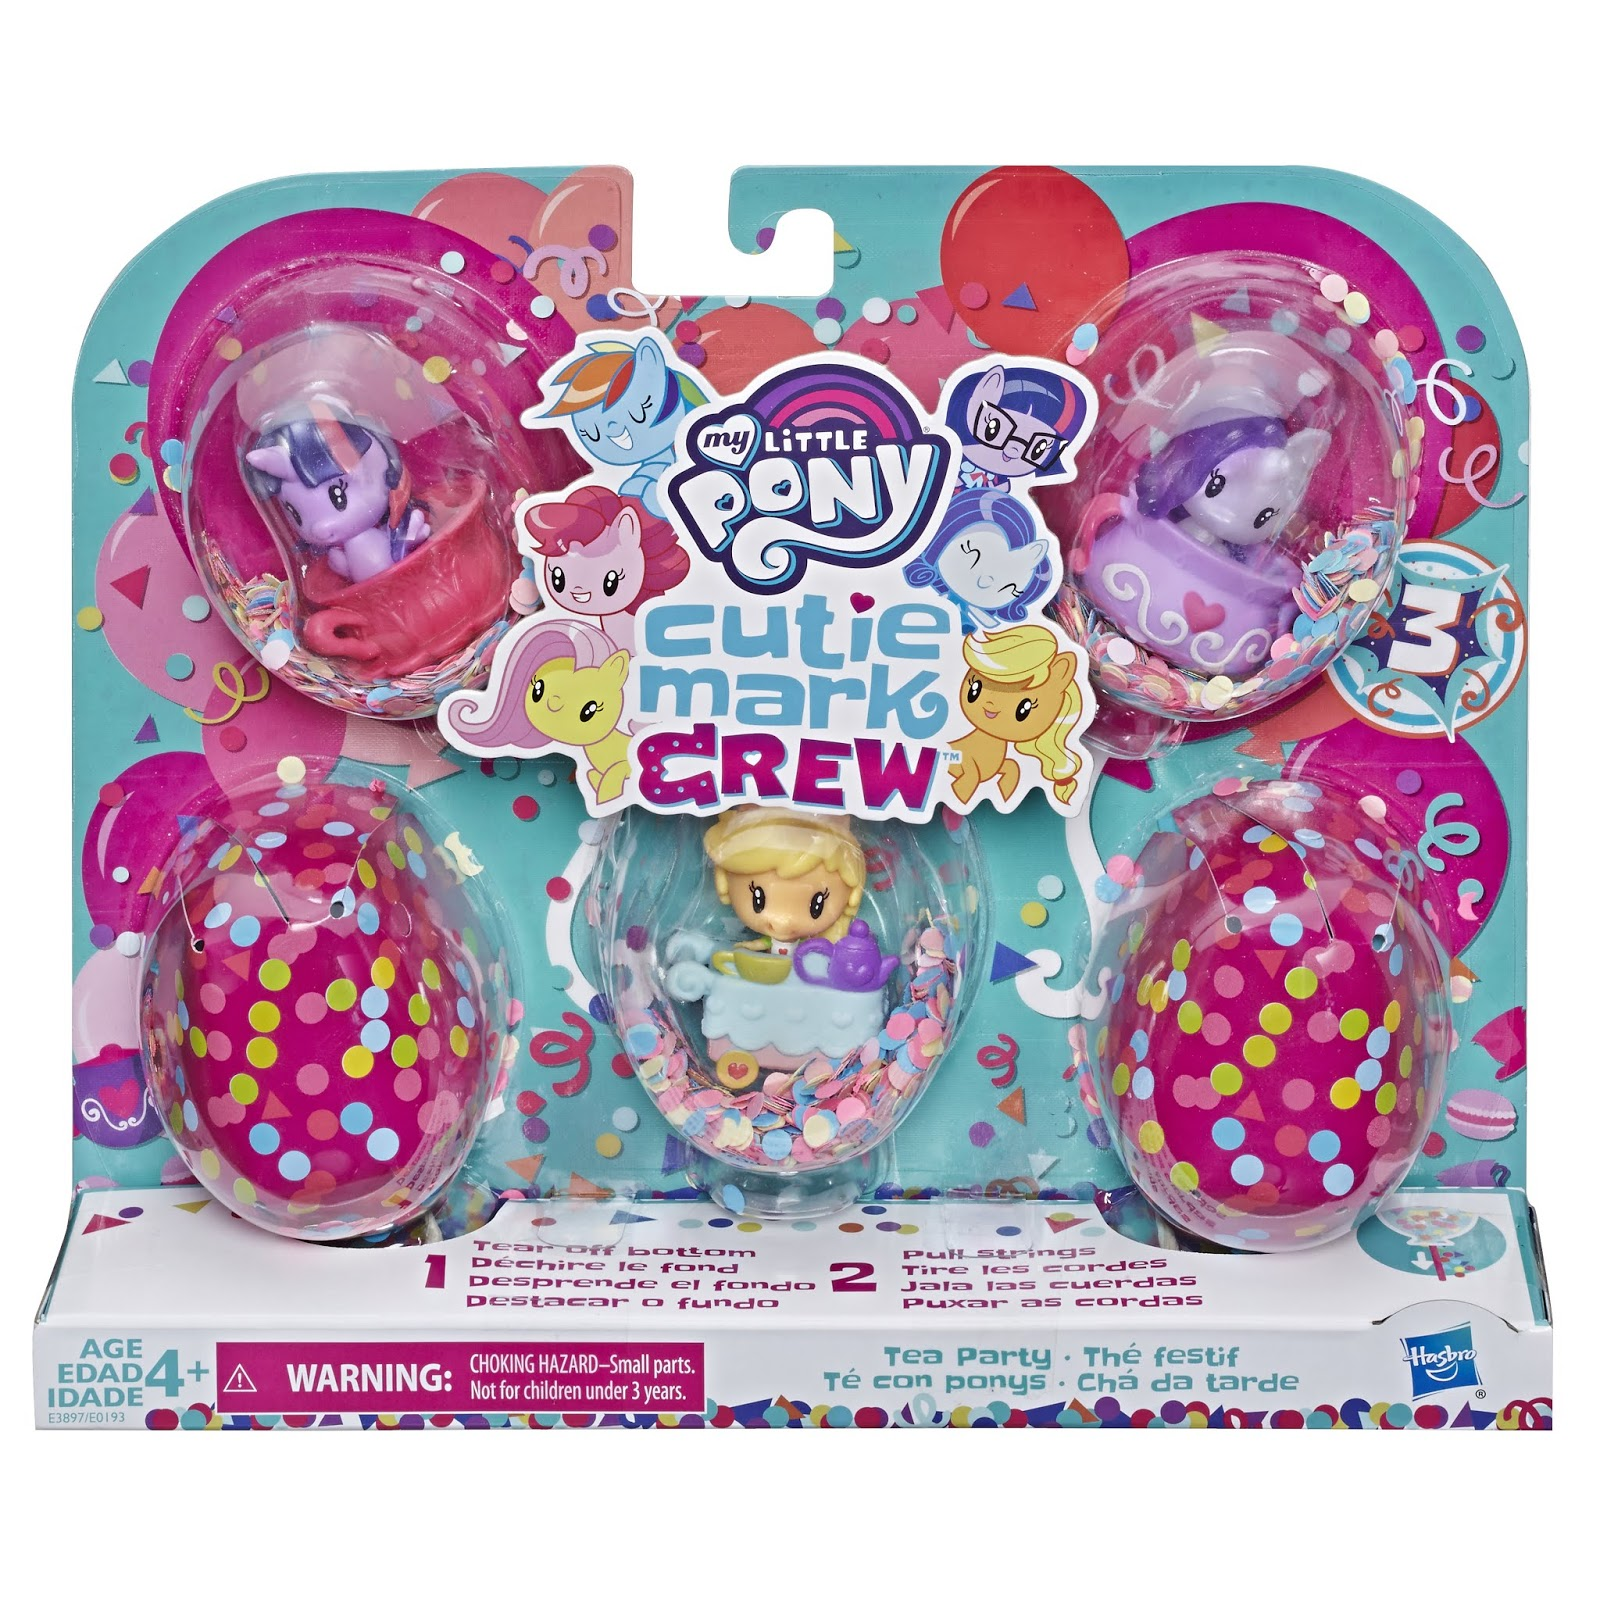 218b2dbfd39 Vietnamese Website Lists Series 3 Cutie Mark Crew 5-Packs